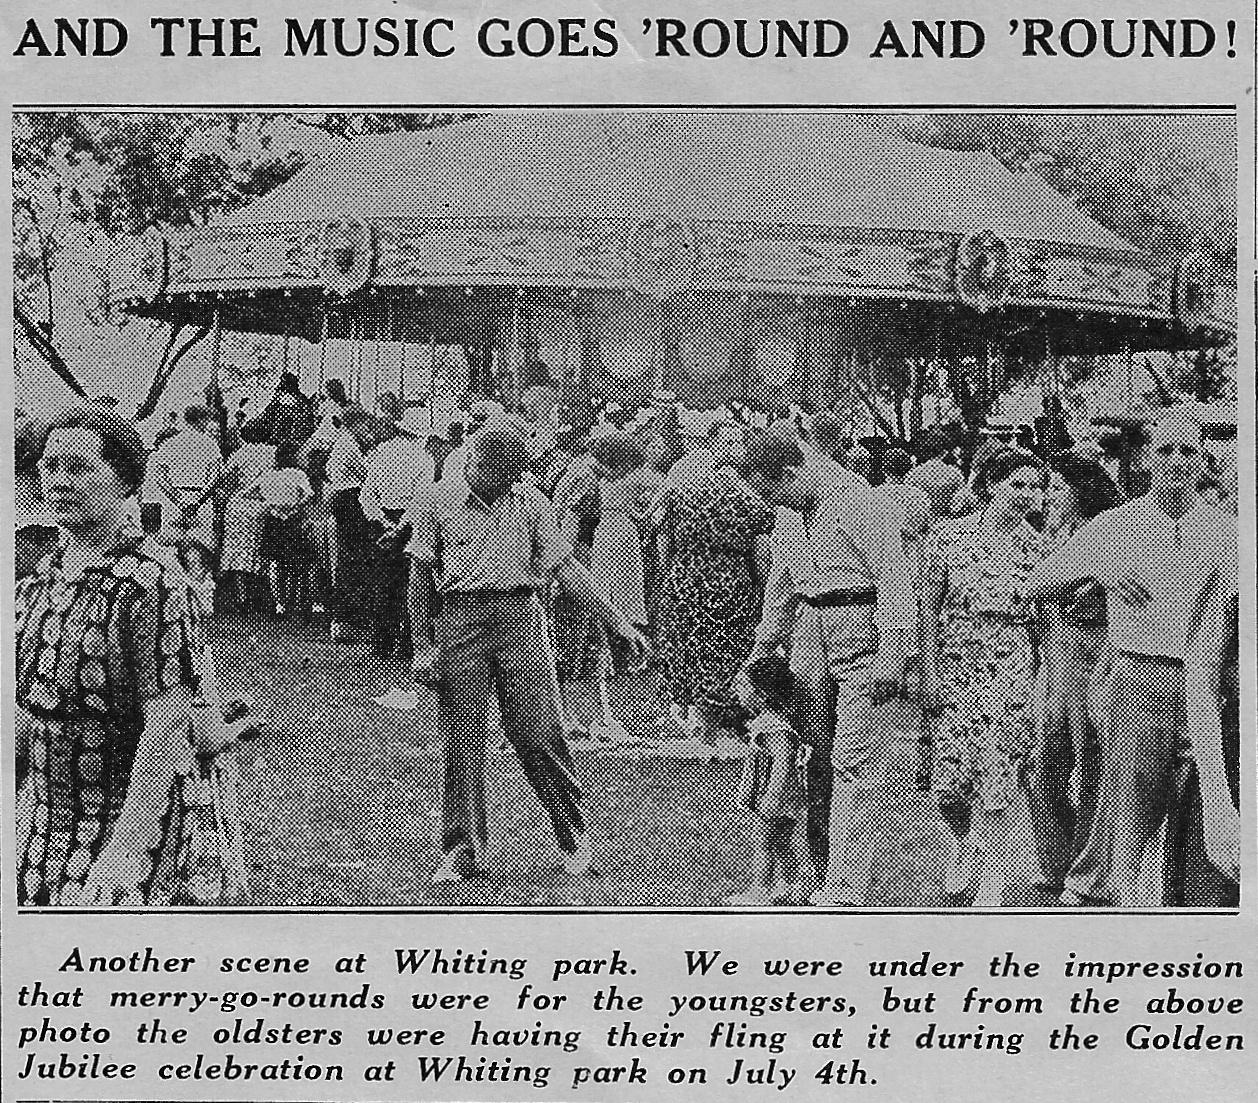 Historical Ed. - Merry-go-round.bmp.jpg